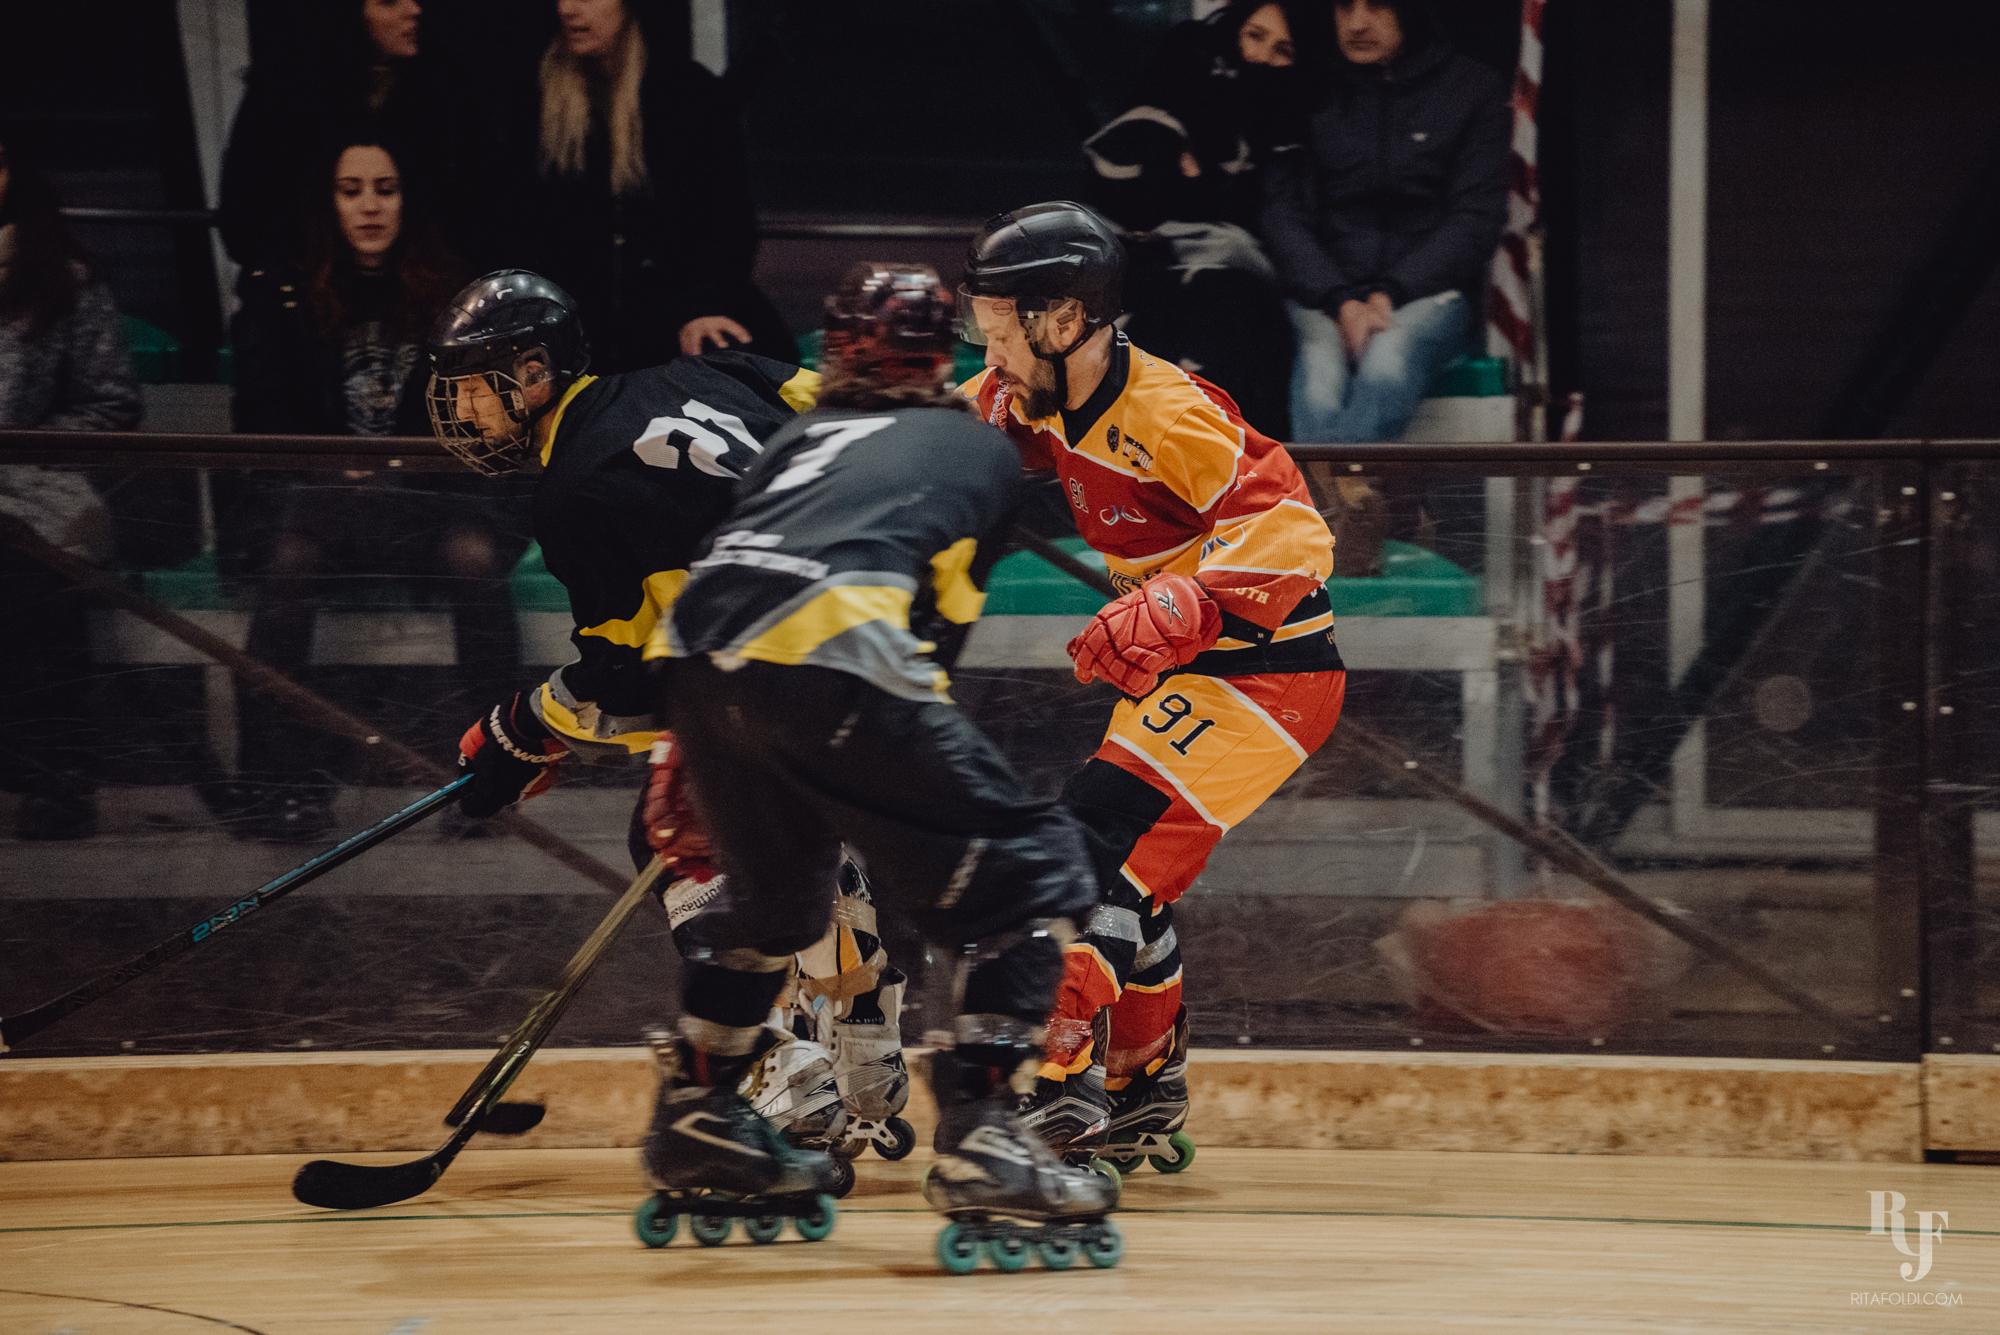 hockey roma, inline hockey roma, roma hockey, rome hockey, inline hockey rome, mammuth hockey, mammuth roma, hockey mammuth, sports photography, rita foldi photography